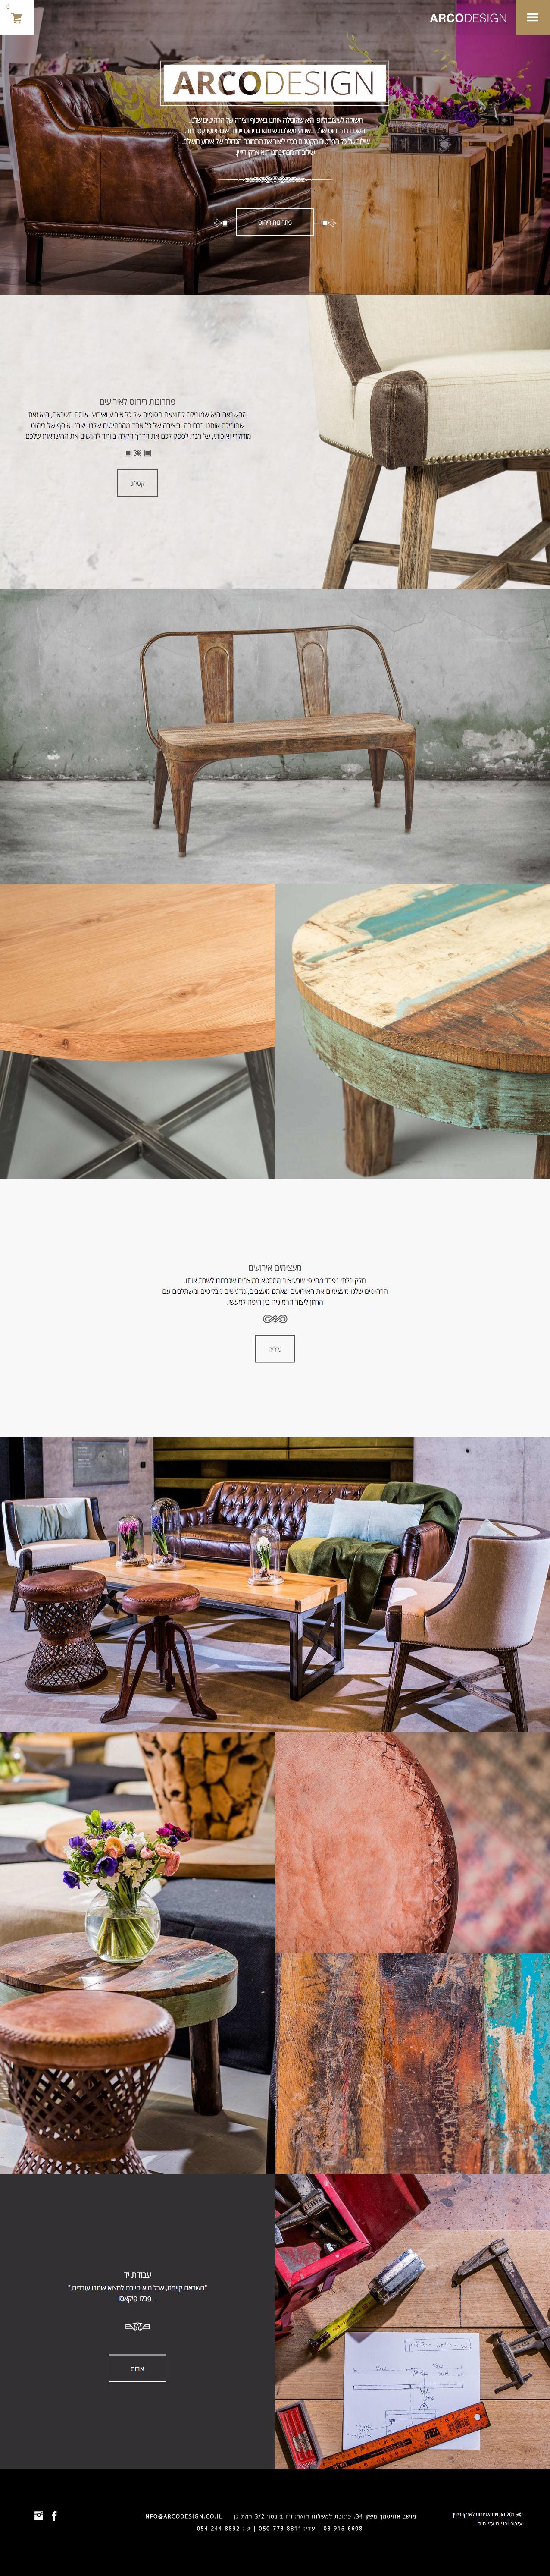 Full Web Design Inspiration - Arco Design